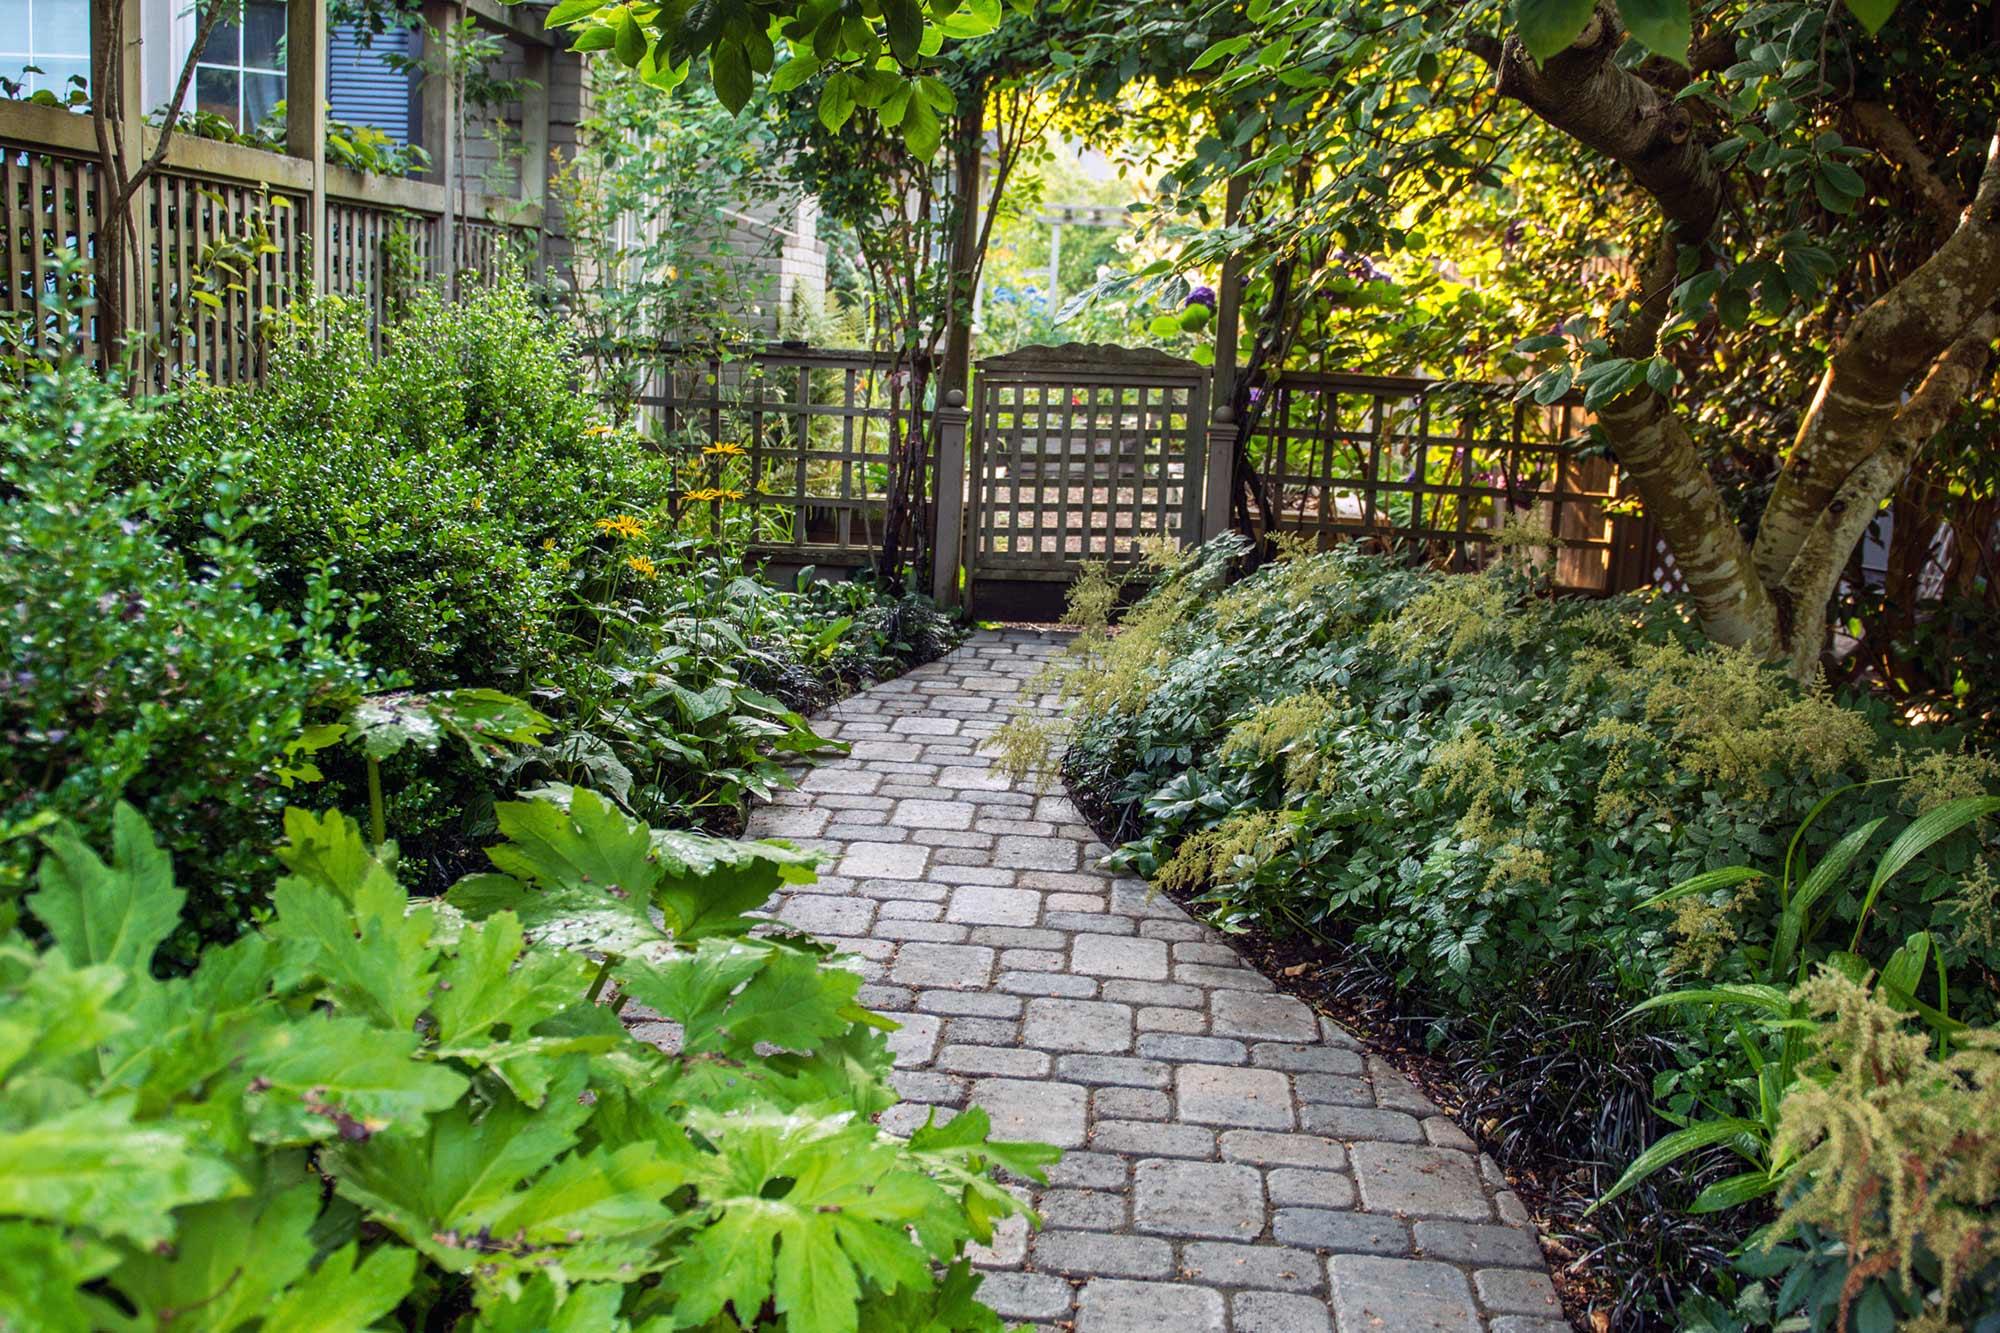 Roman Domion paver walkway